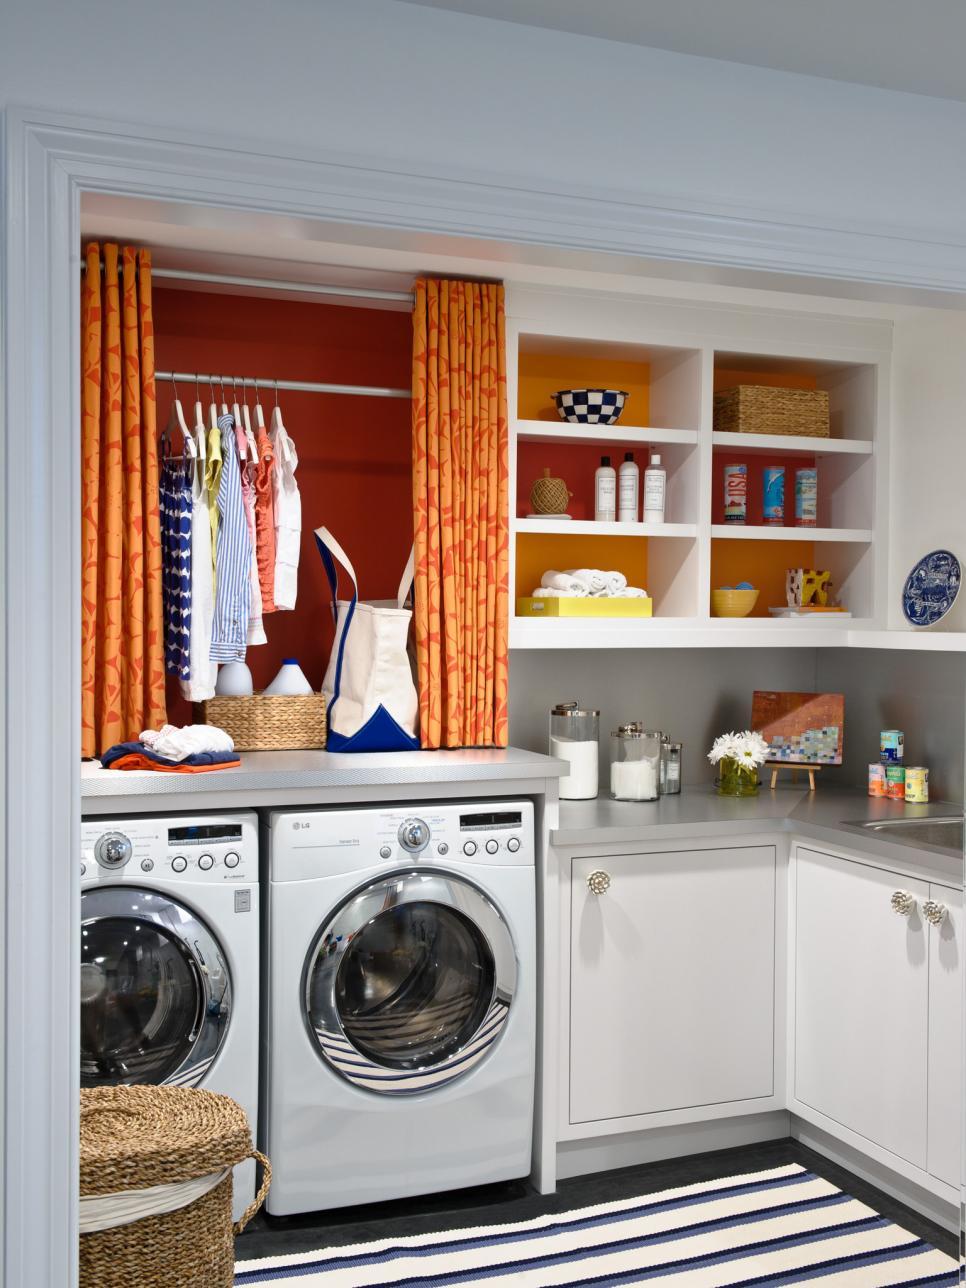 8 tidy laundry rooms that make washday fun hgtv